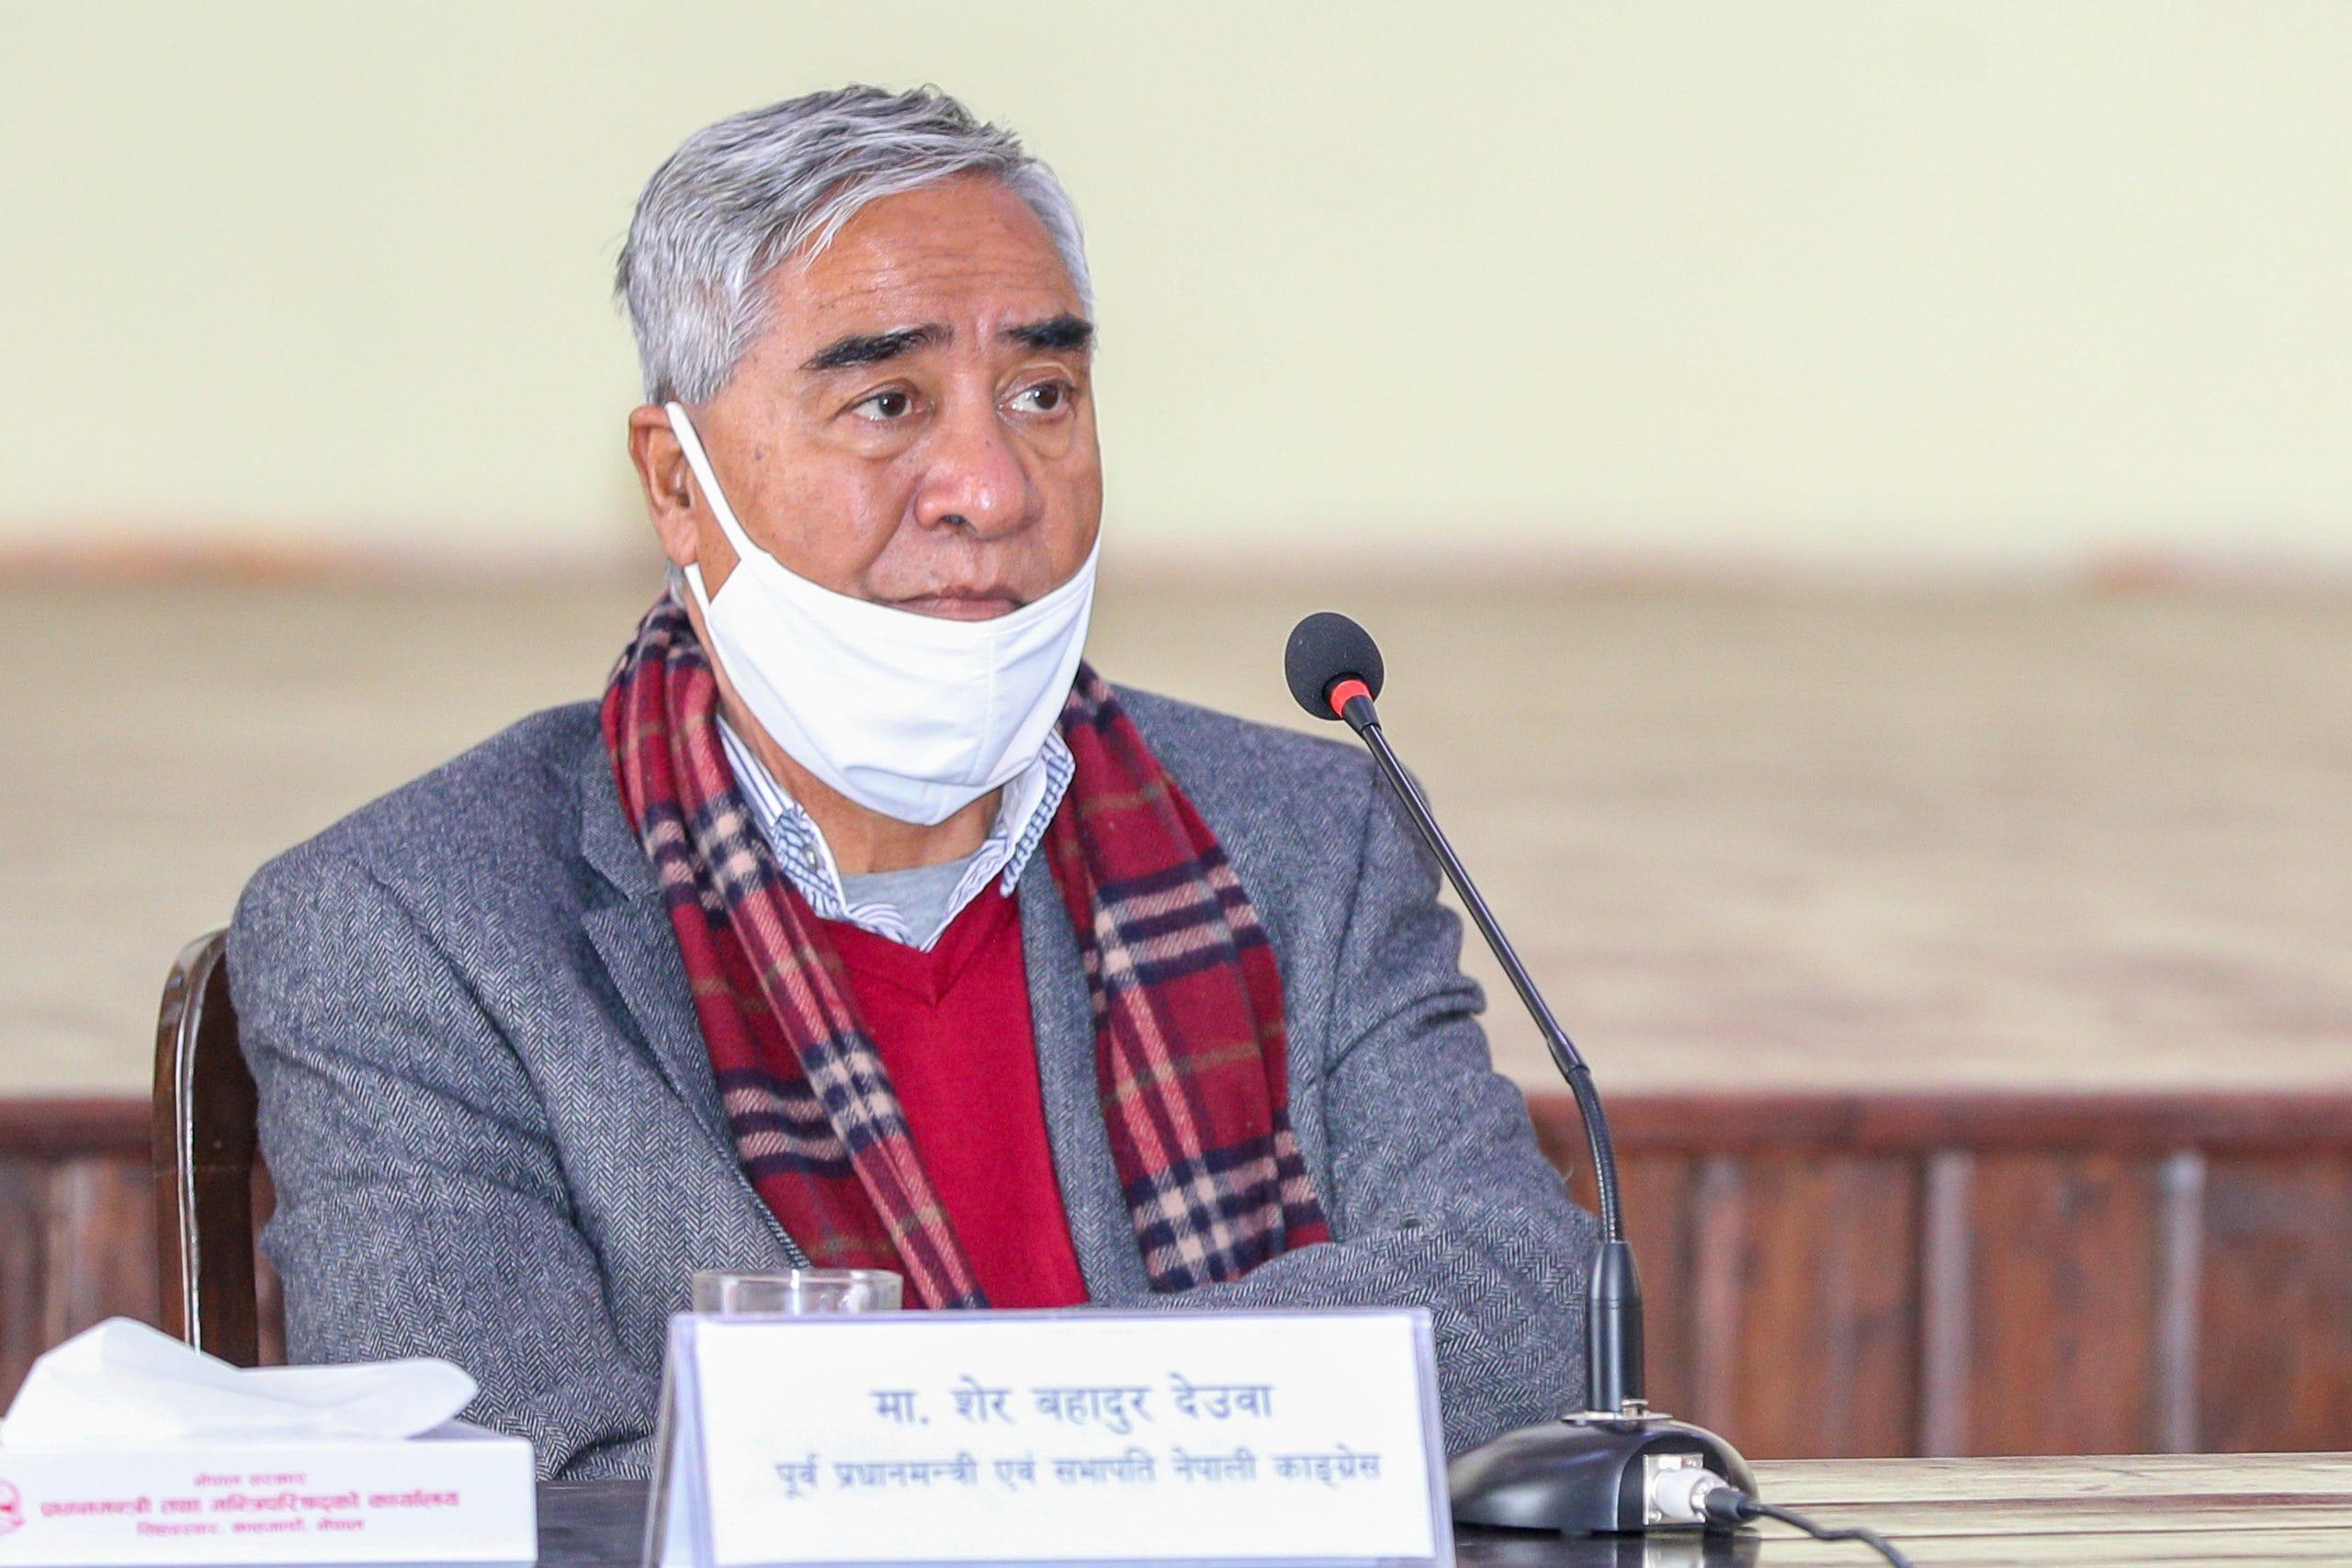 प्रमुख प्रतिपक्षी दल नेपाली कांग्रेसका सभापति शेरबहादुर देउवा सर्वदलीय बैठकको बिचबाटै बाहिरे